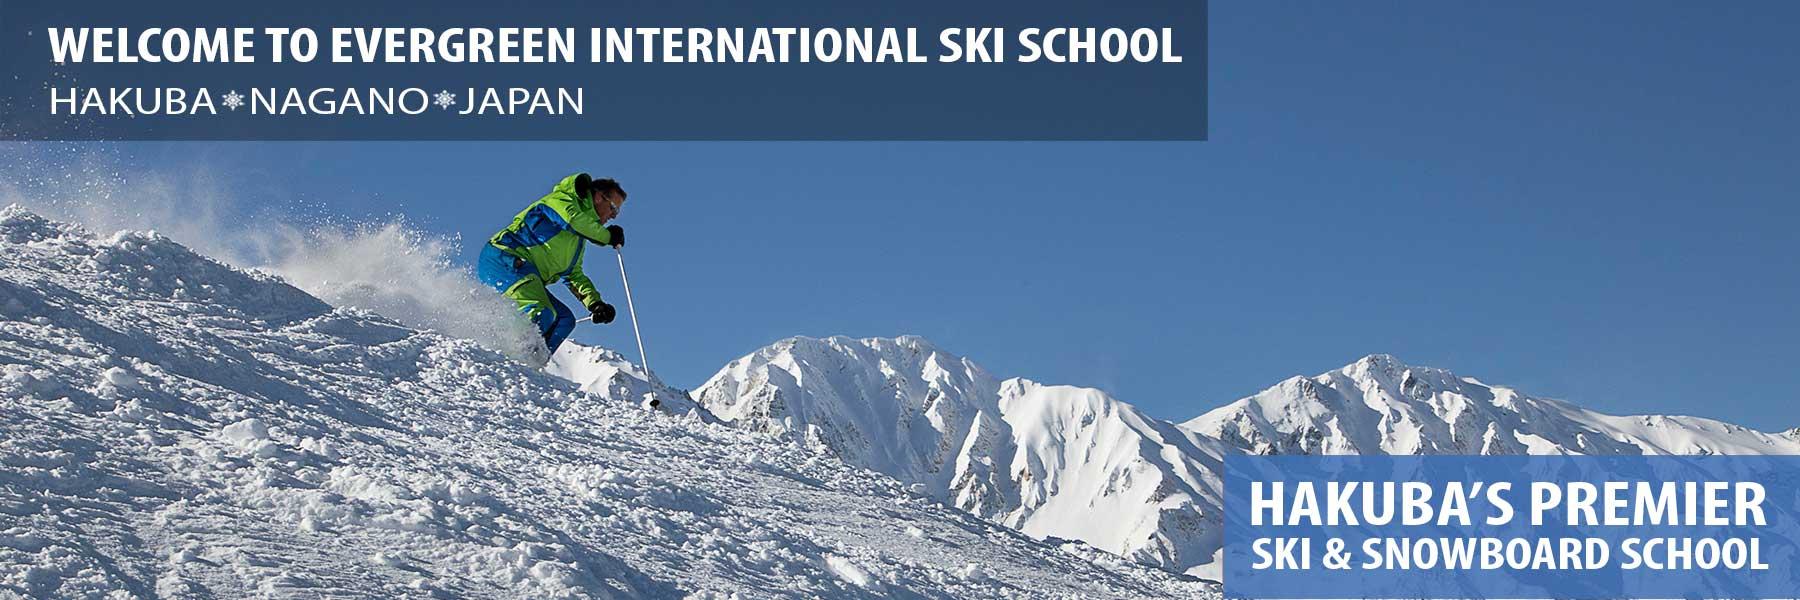 japan ski school header - mountains and blue sky